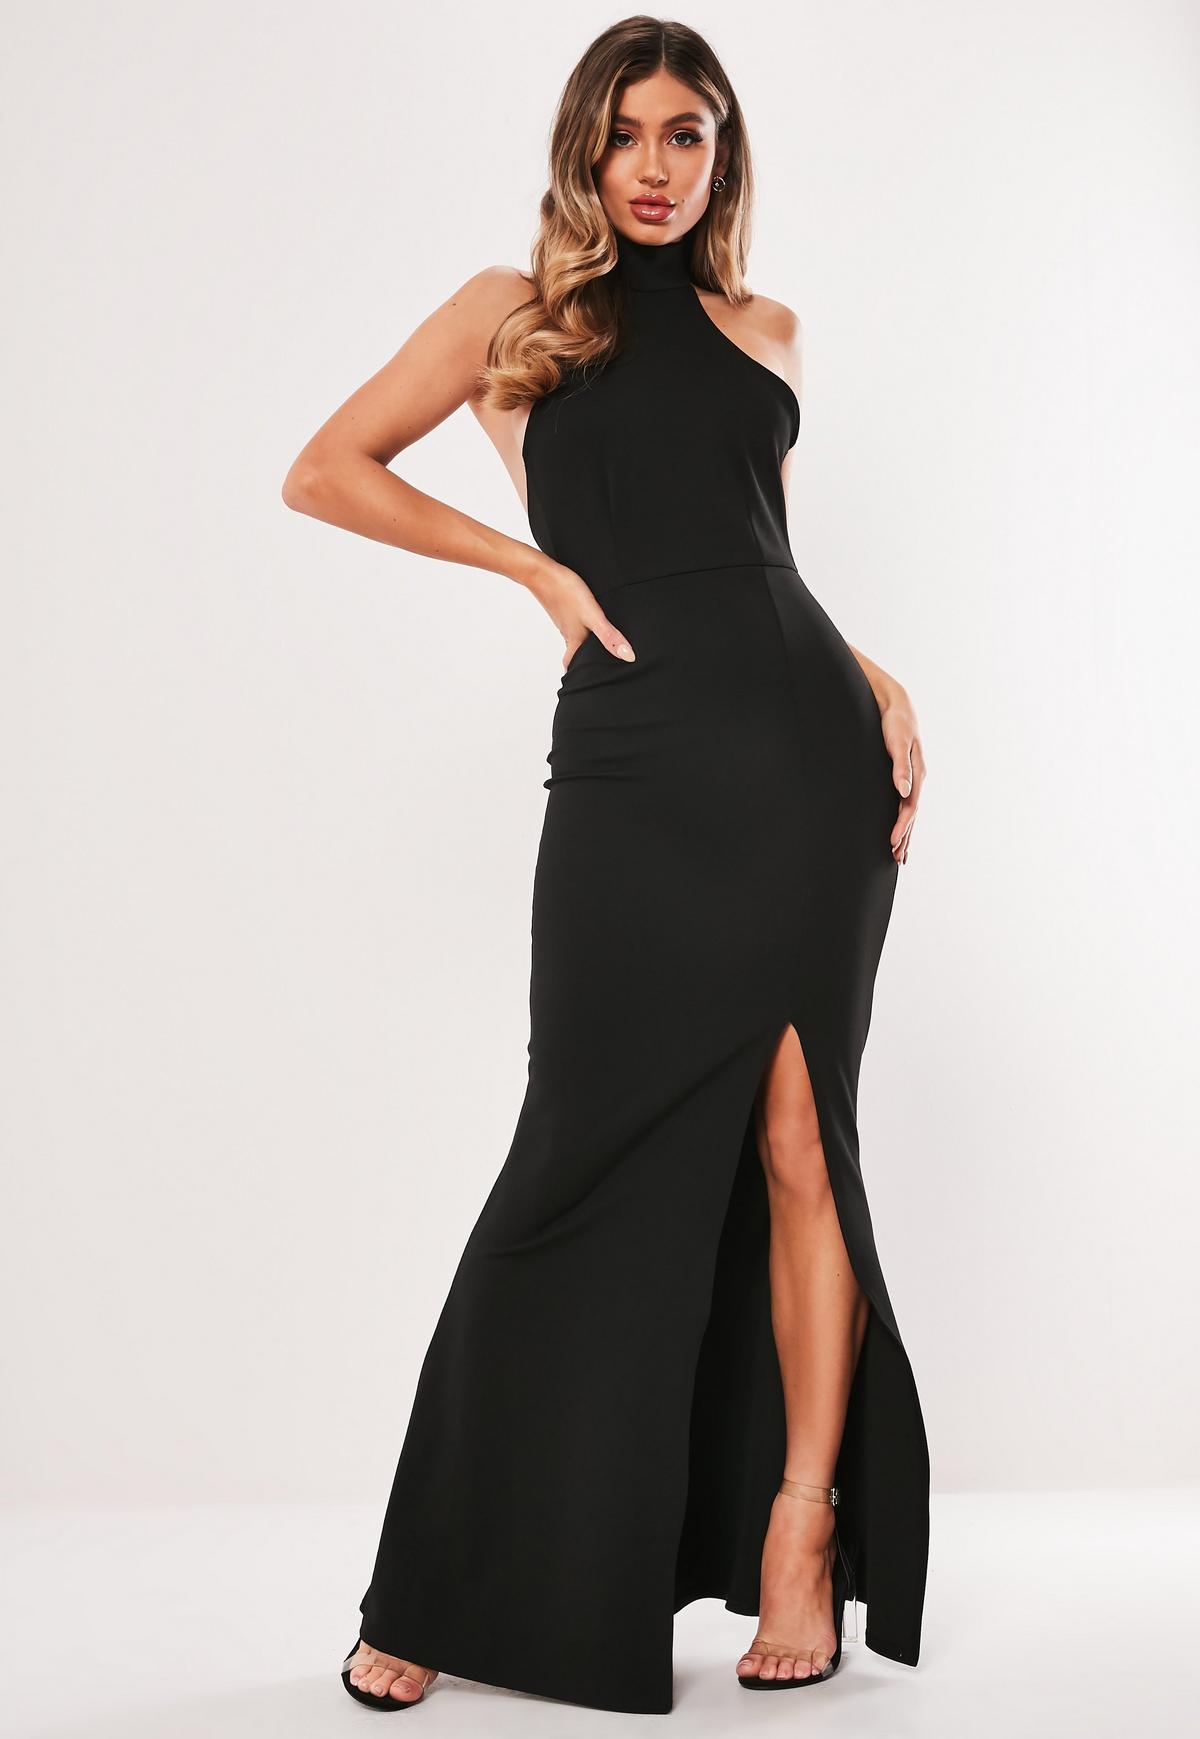 pessimistico plastica sensibilità  Petite Black Racer Back Maxi Dress | Missguided